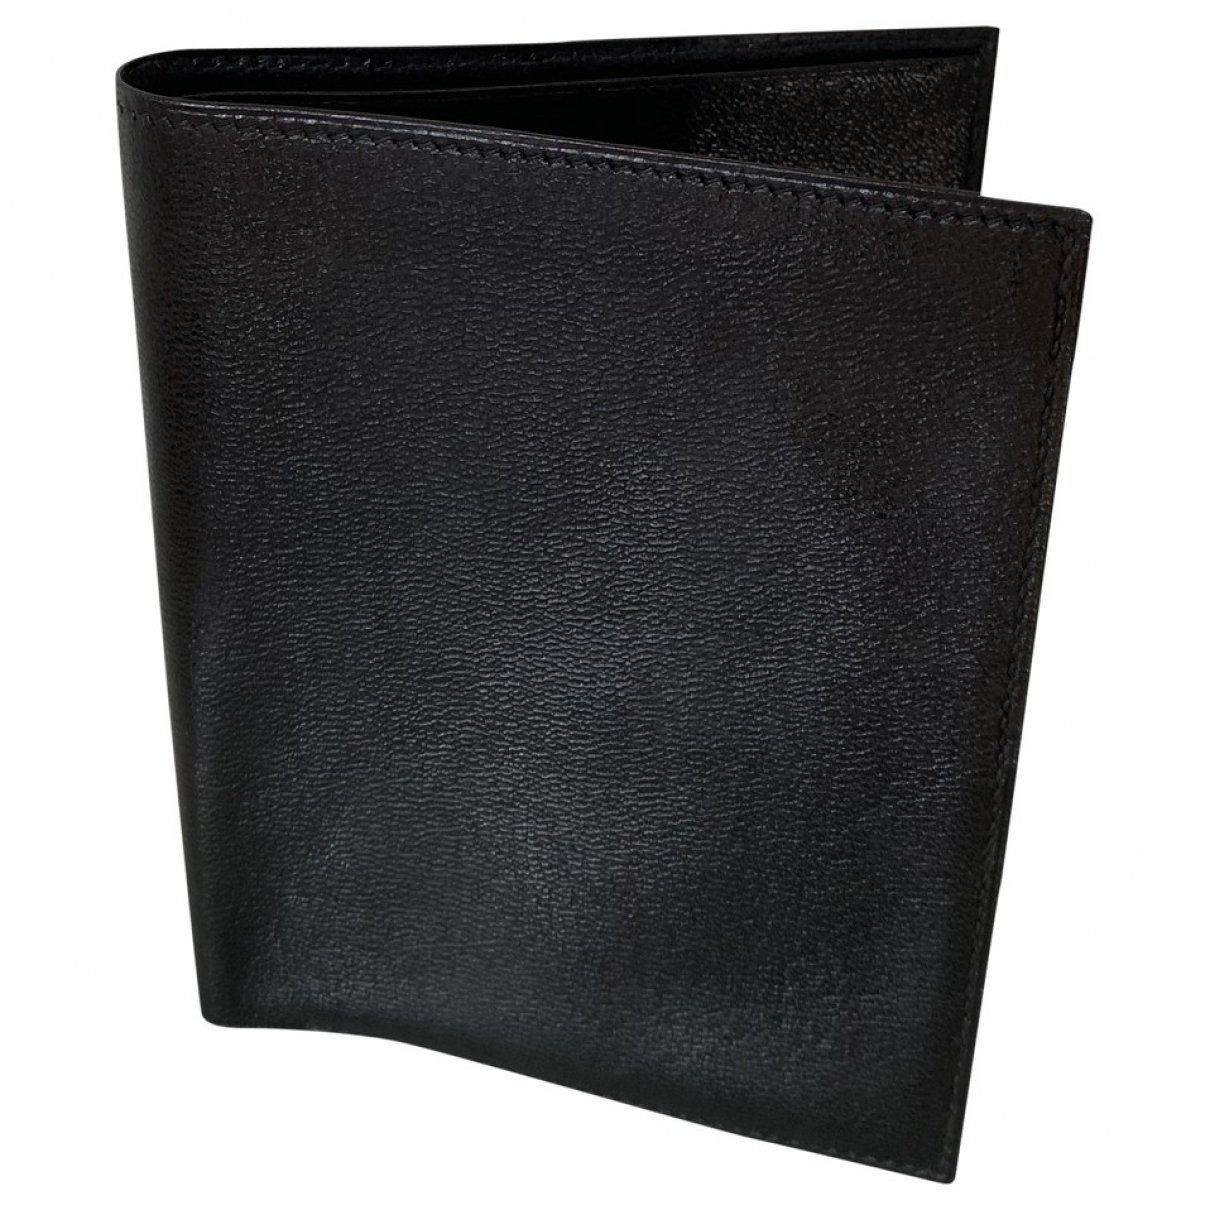 Hermes \N Kleinlederwaren in  Schwarz Leder